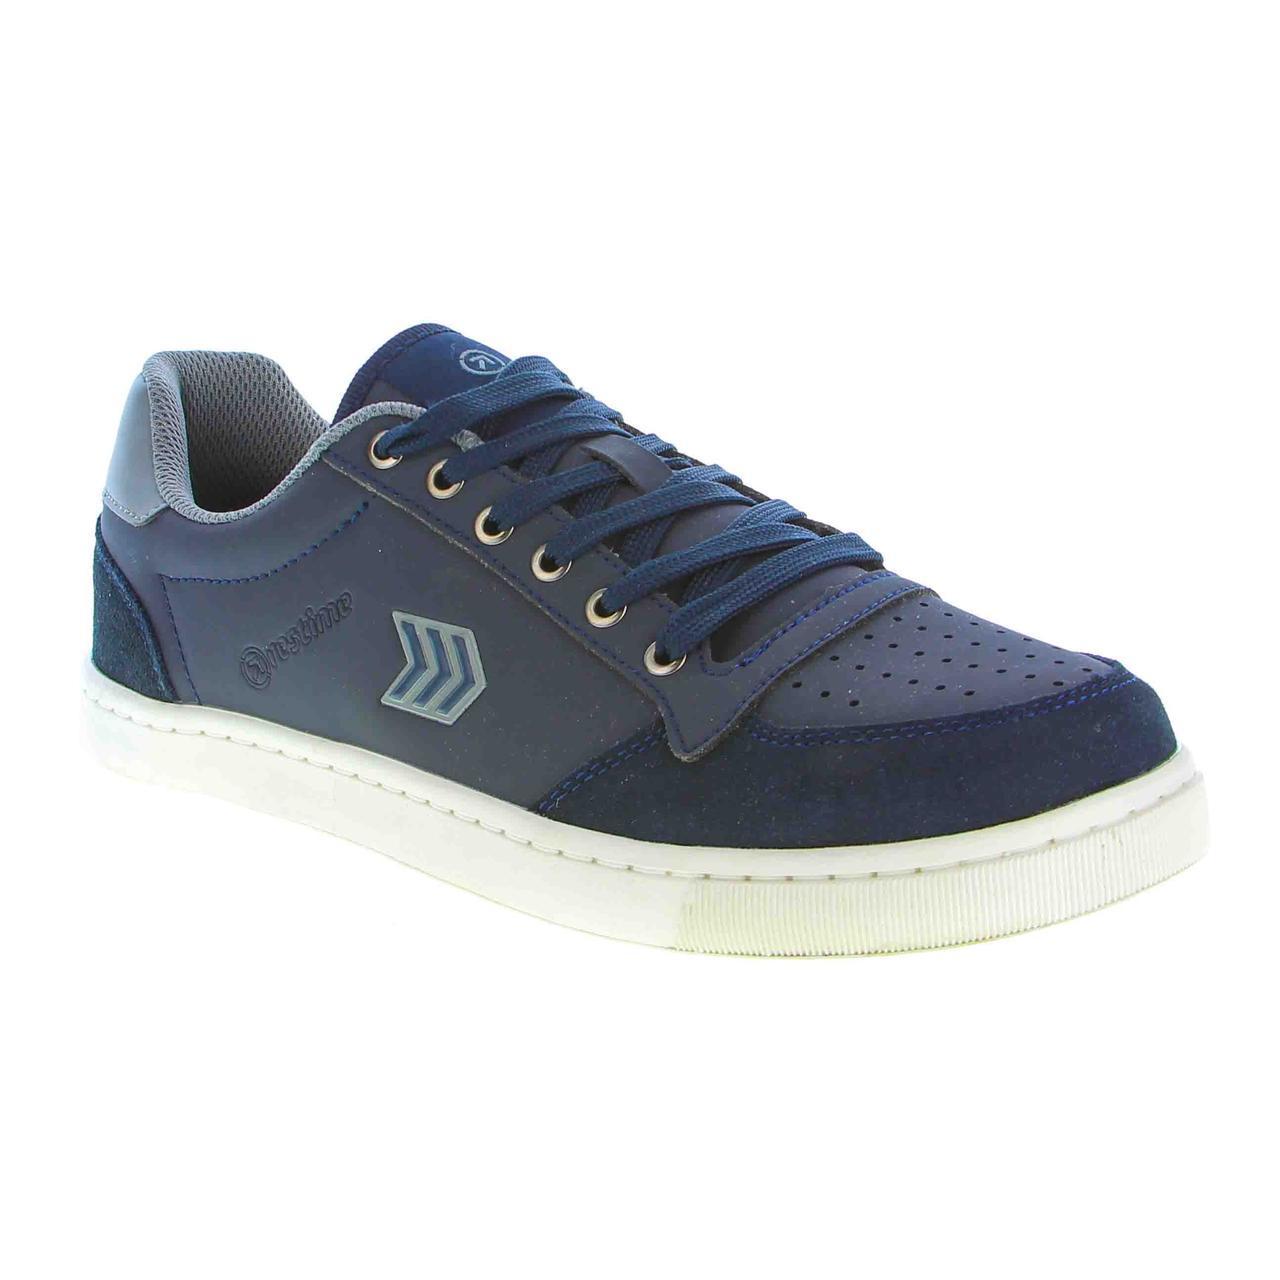 Мужские синие кроссовки Restime PMB19336 Navy